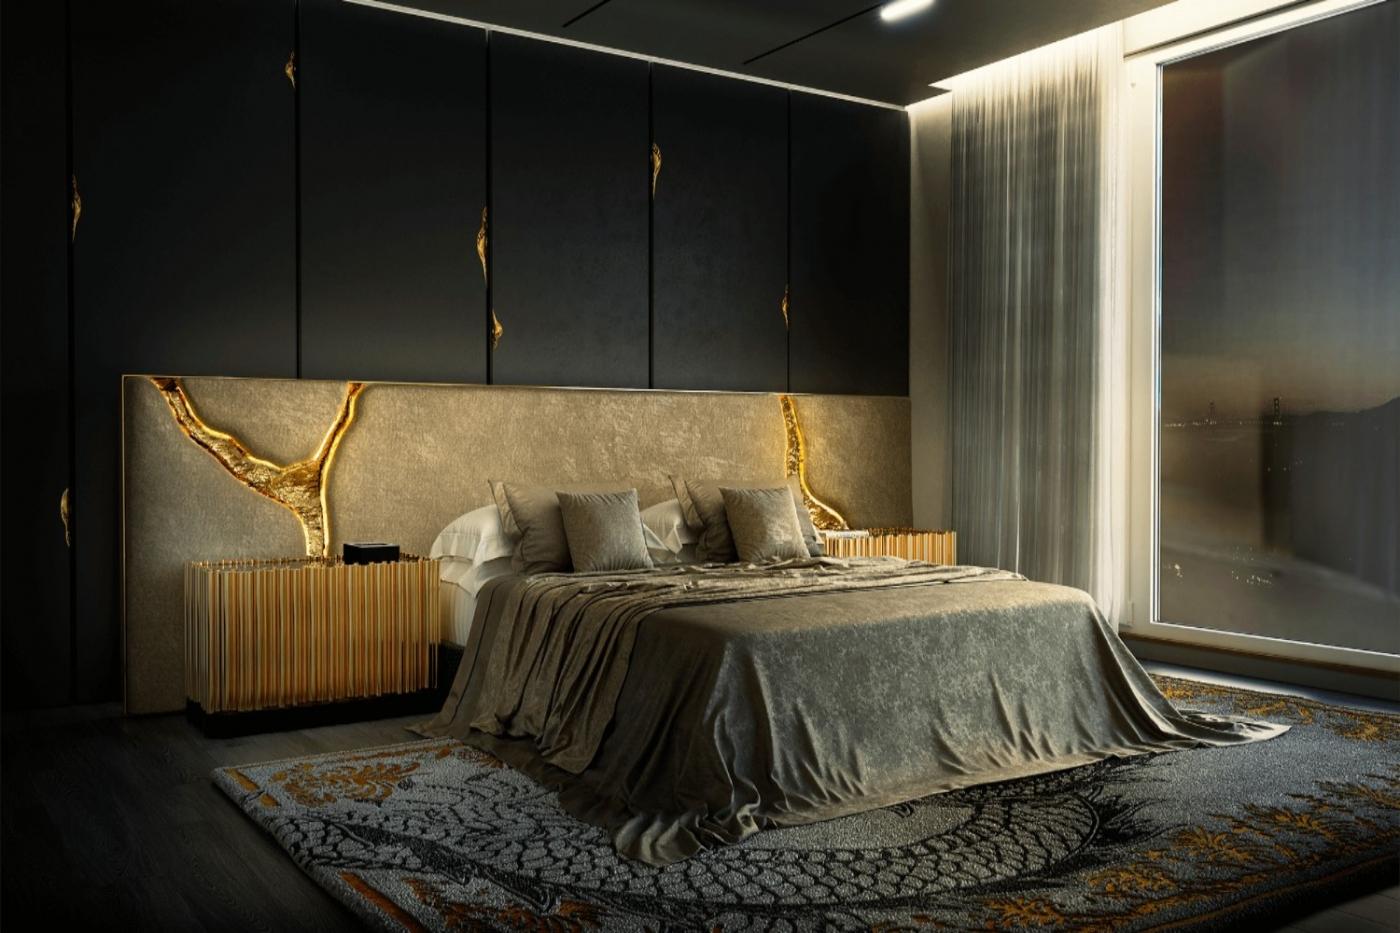 Bedroom Interior Design Dubai bedroom interior design Perfect Bedroom Interior Design Projects For Dubai's Lifestyle lapiaz white headboard 04 zoom boca do lobo 1 1400x933